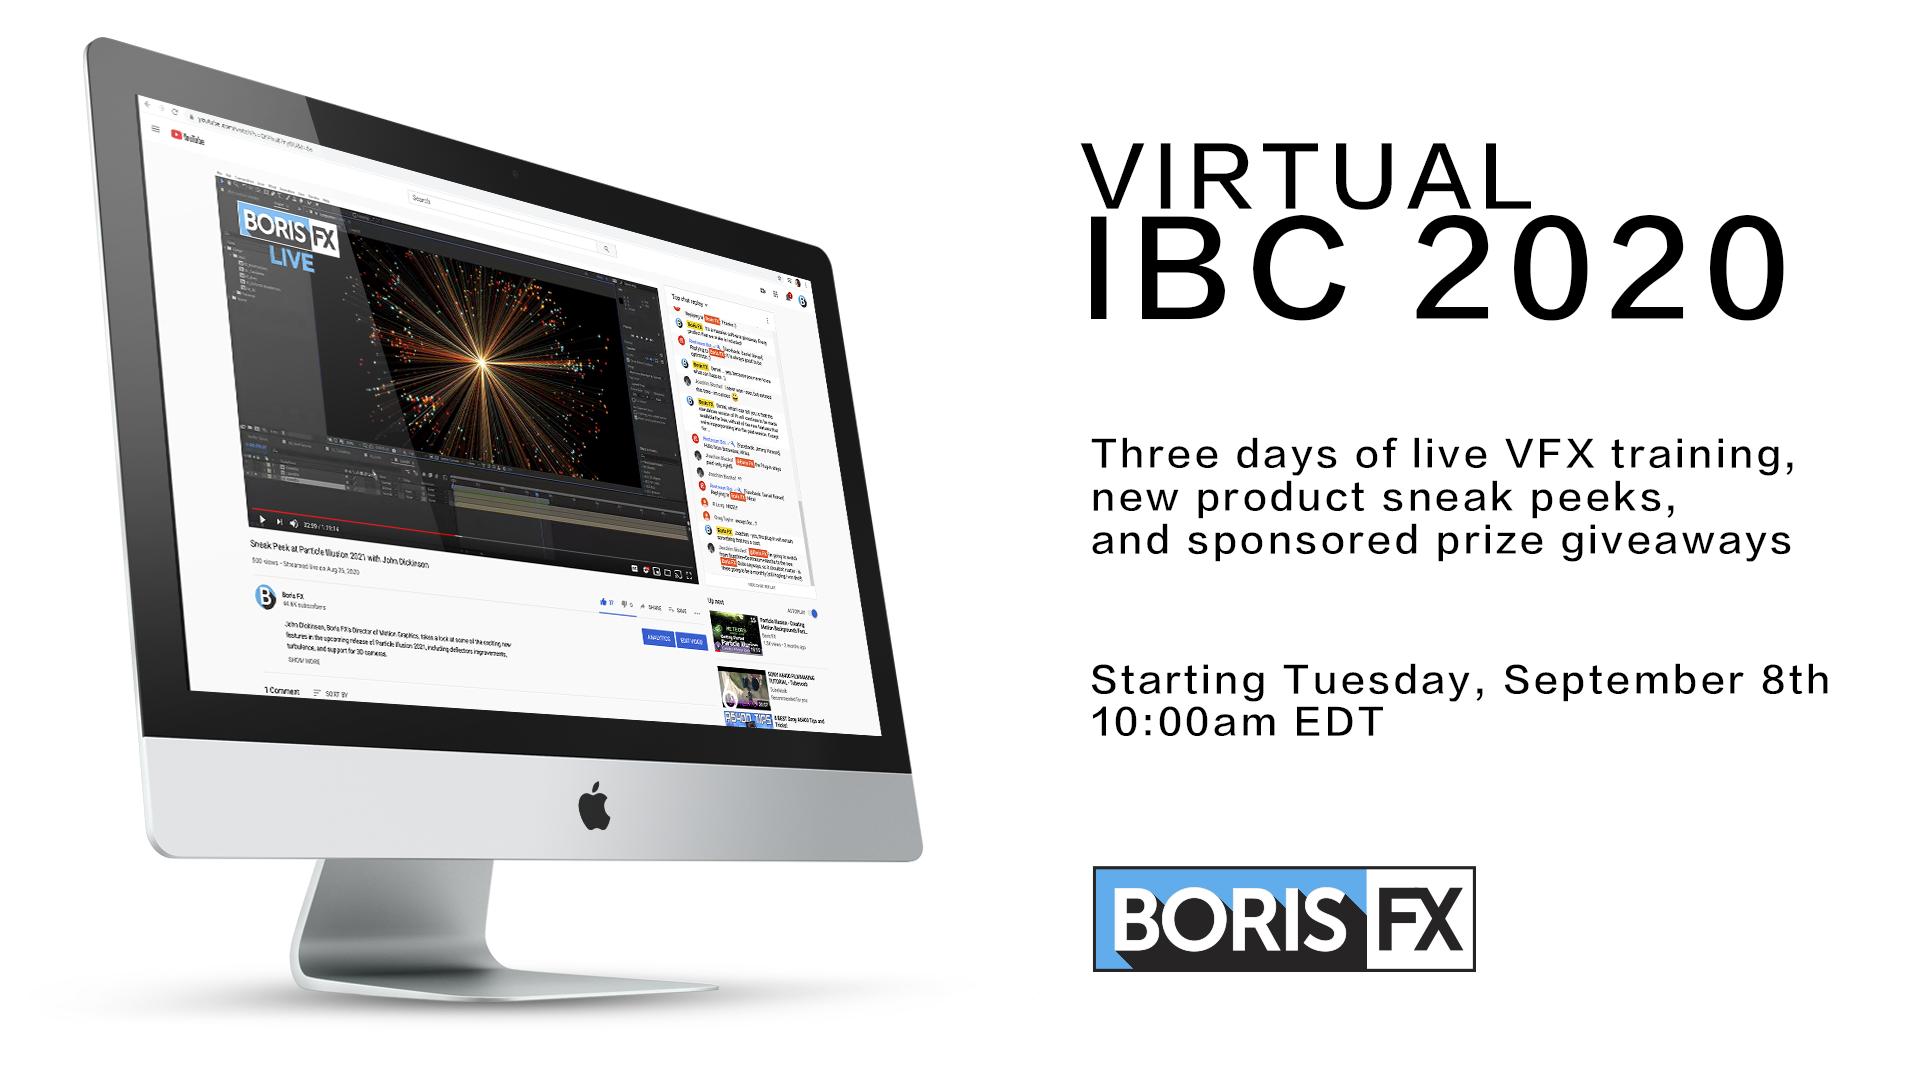 Boris FX IBC 2020 hero image